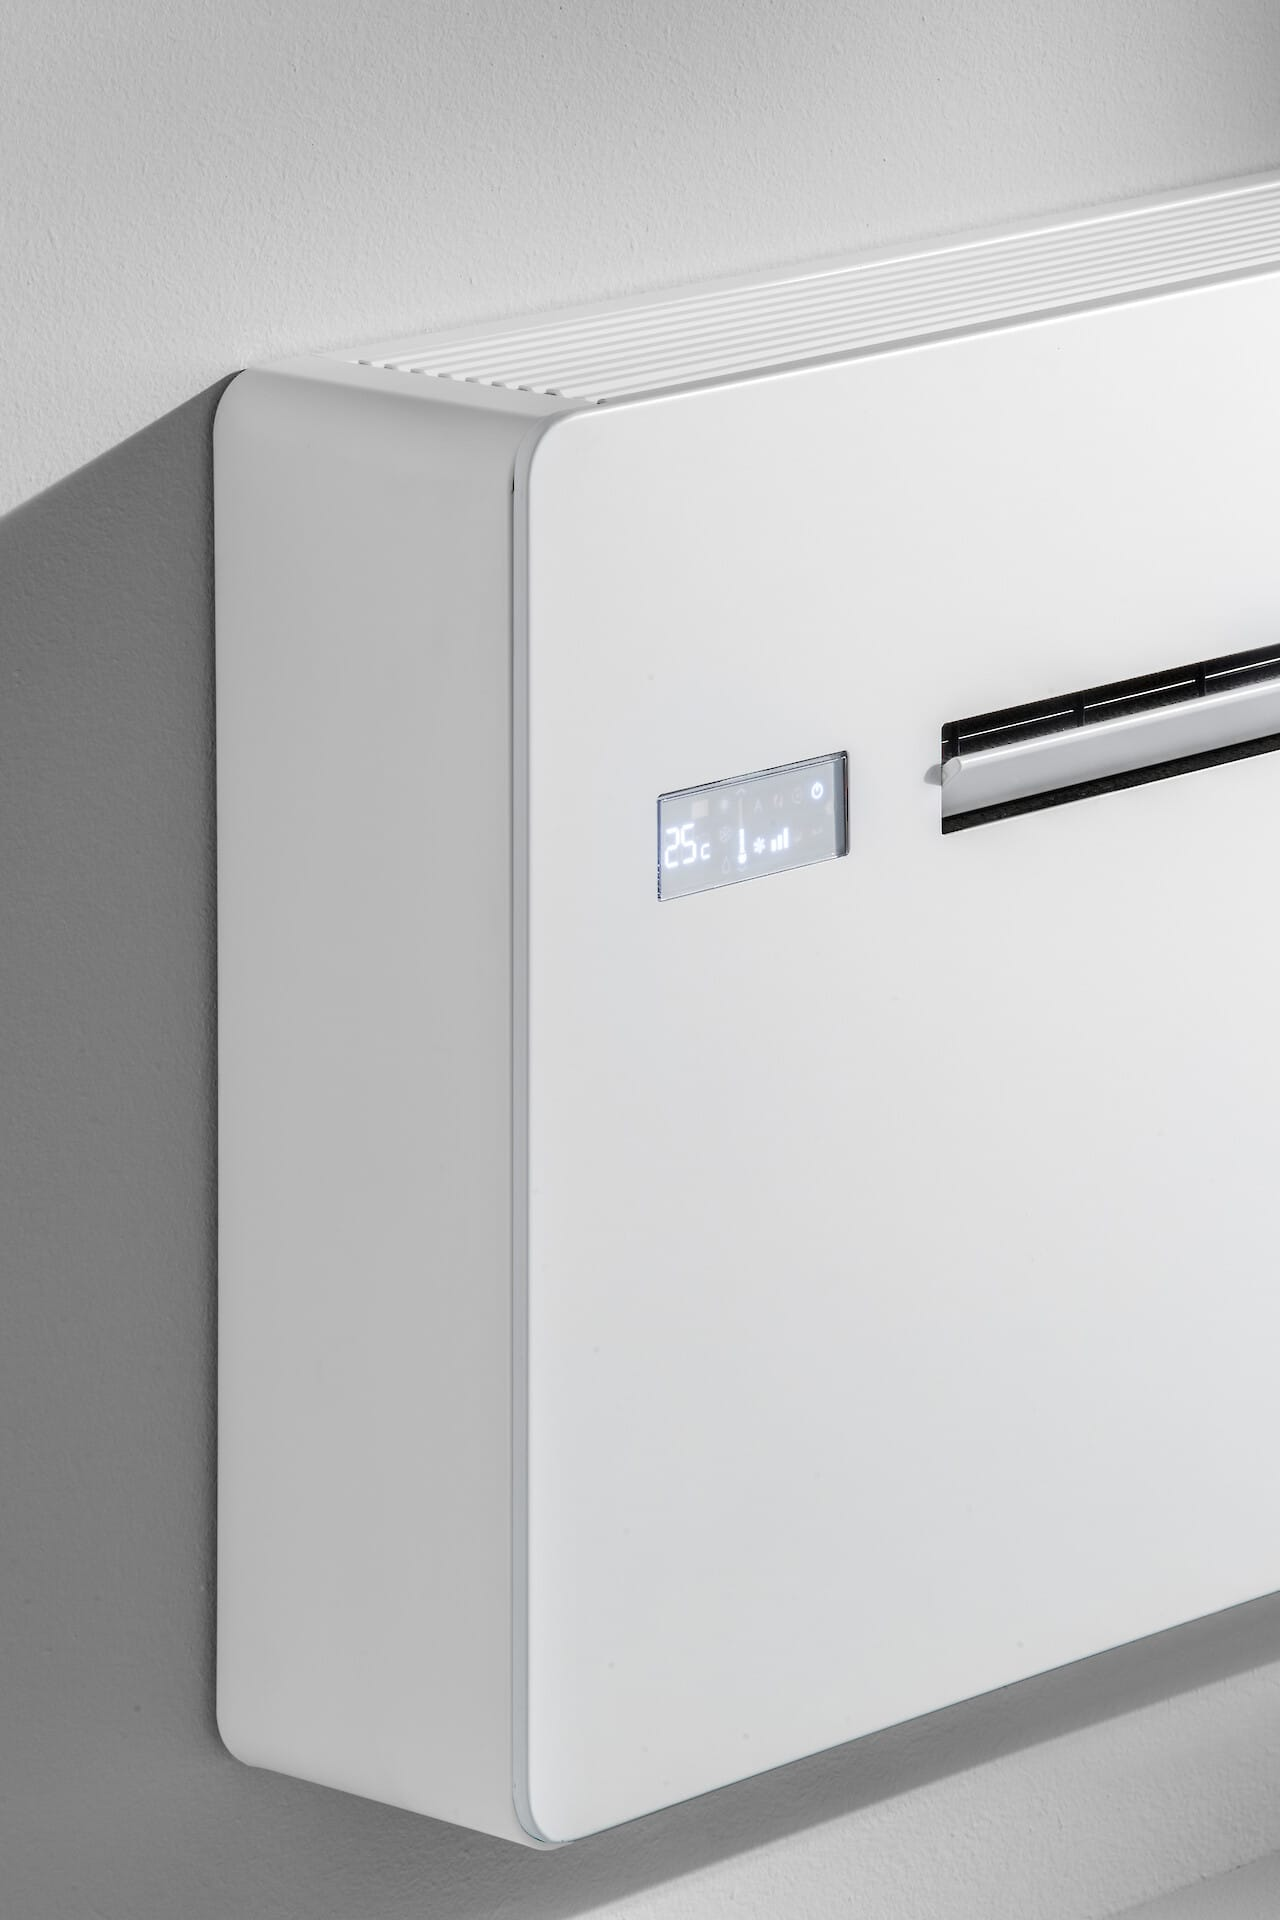 Green House Solutions zonnepanelen batterijopslag laadpalen airconditioning mac84288